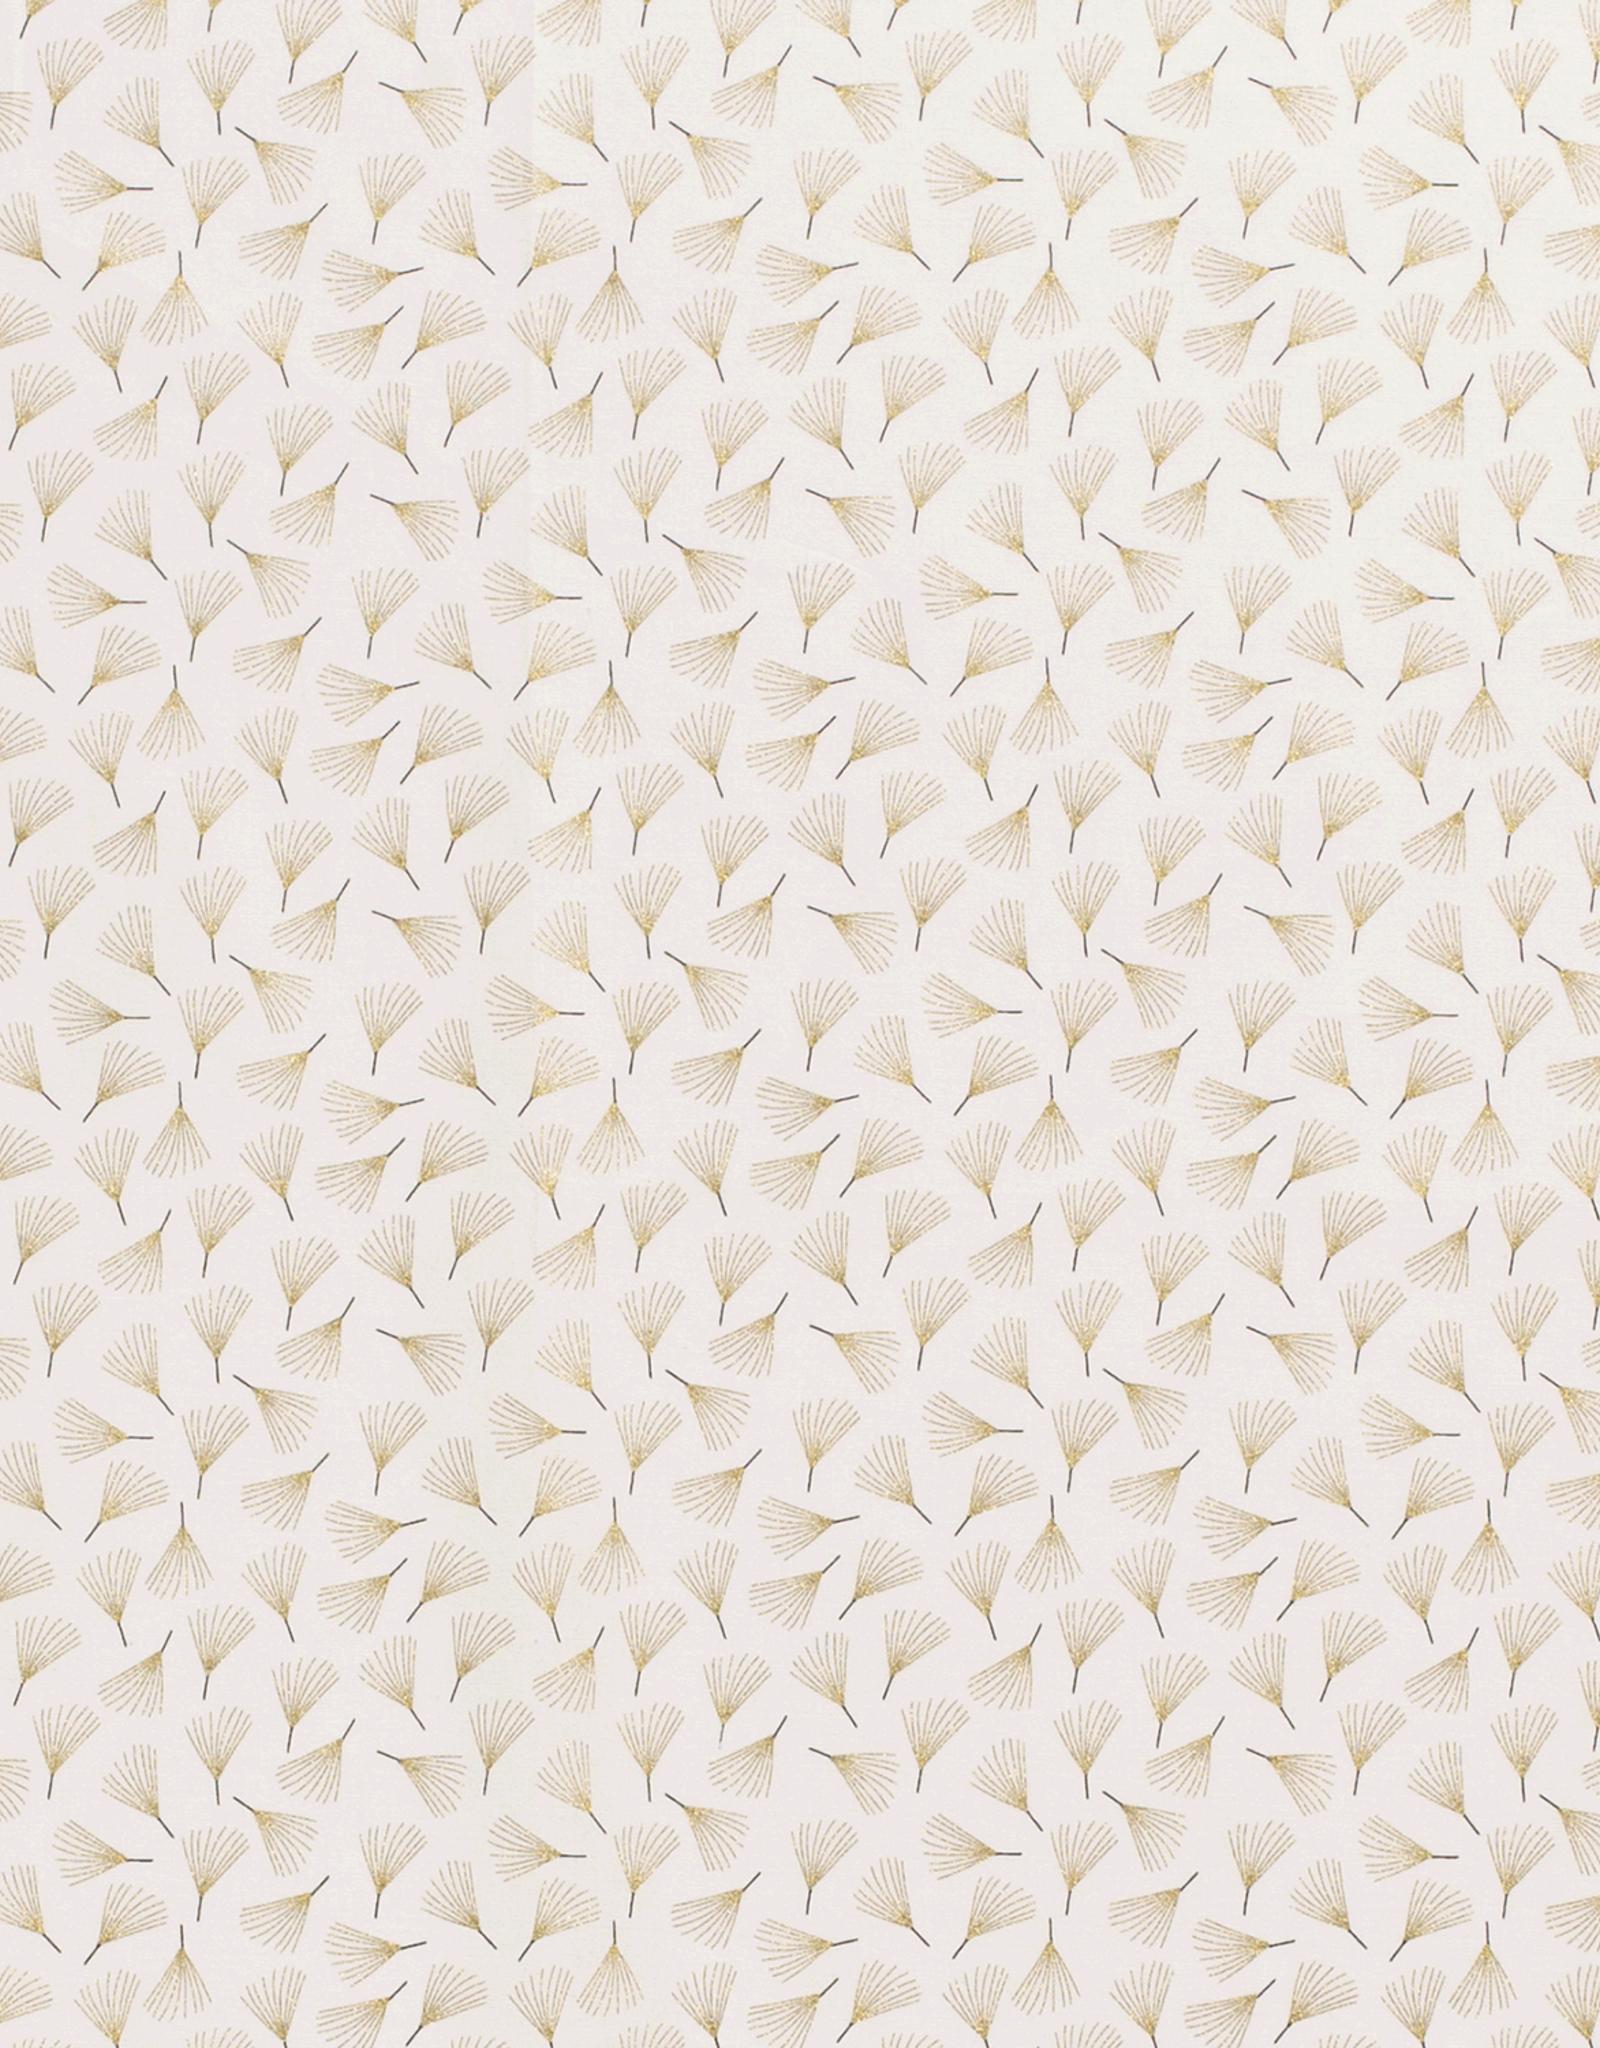 Katoen - Waaier - Crème